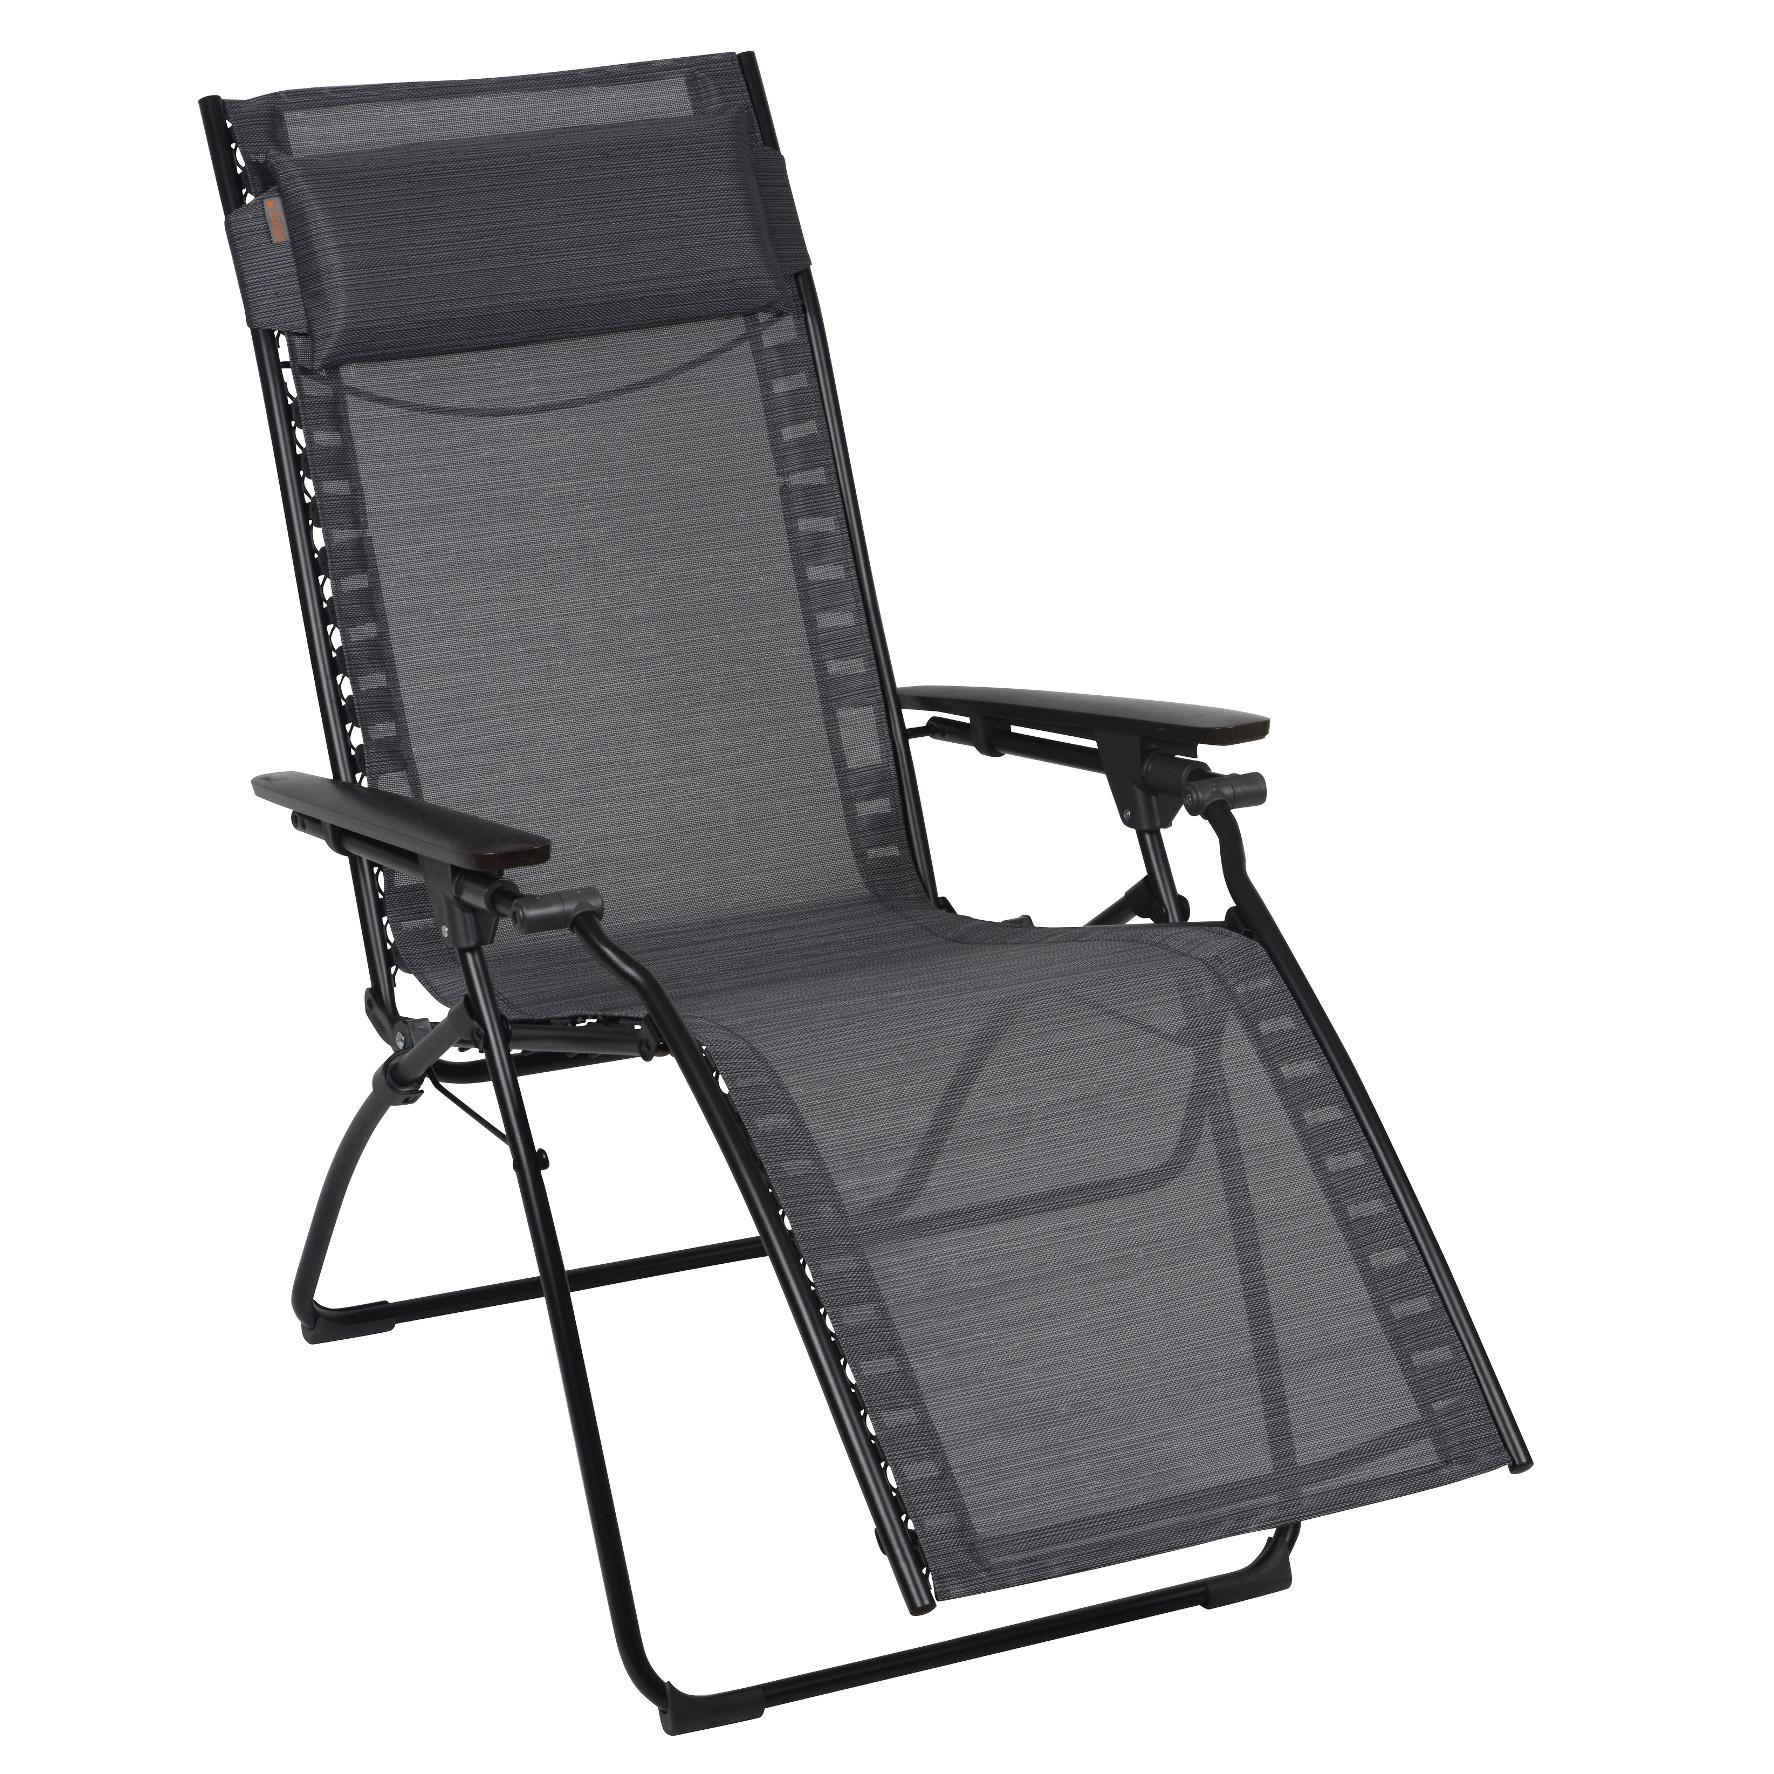 lafuma c evolution chaise pliante natural batyline noir 2. Black Bedroom Furniture Sets. Home Design Ideas